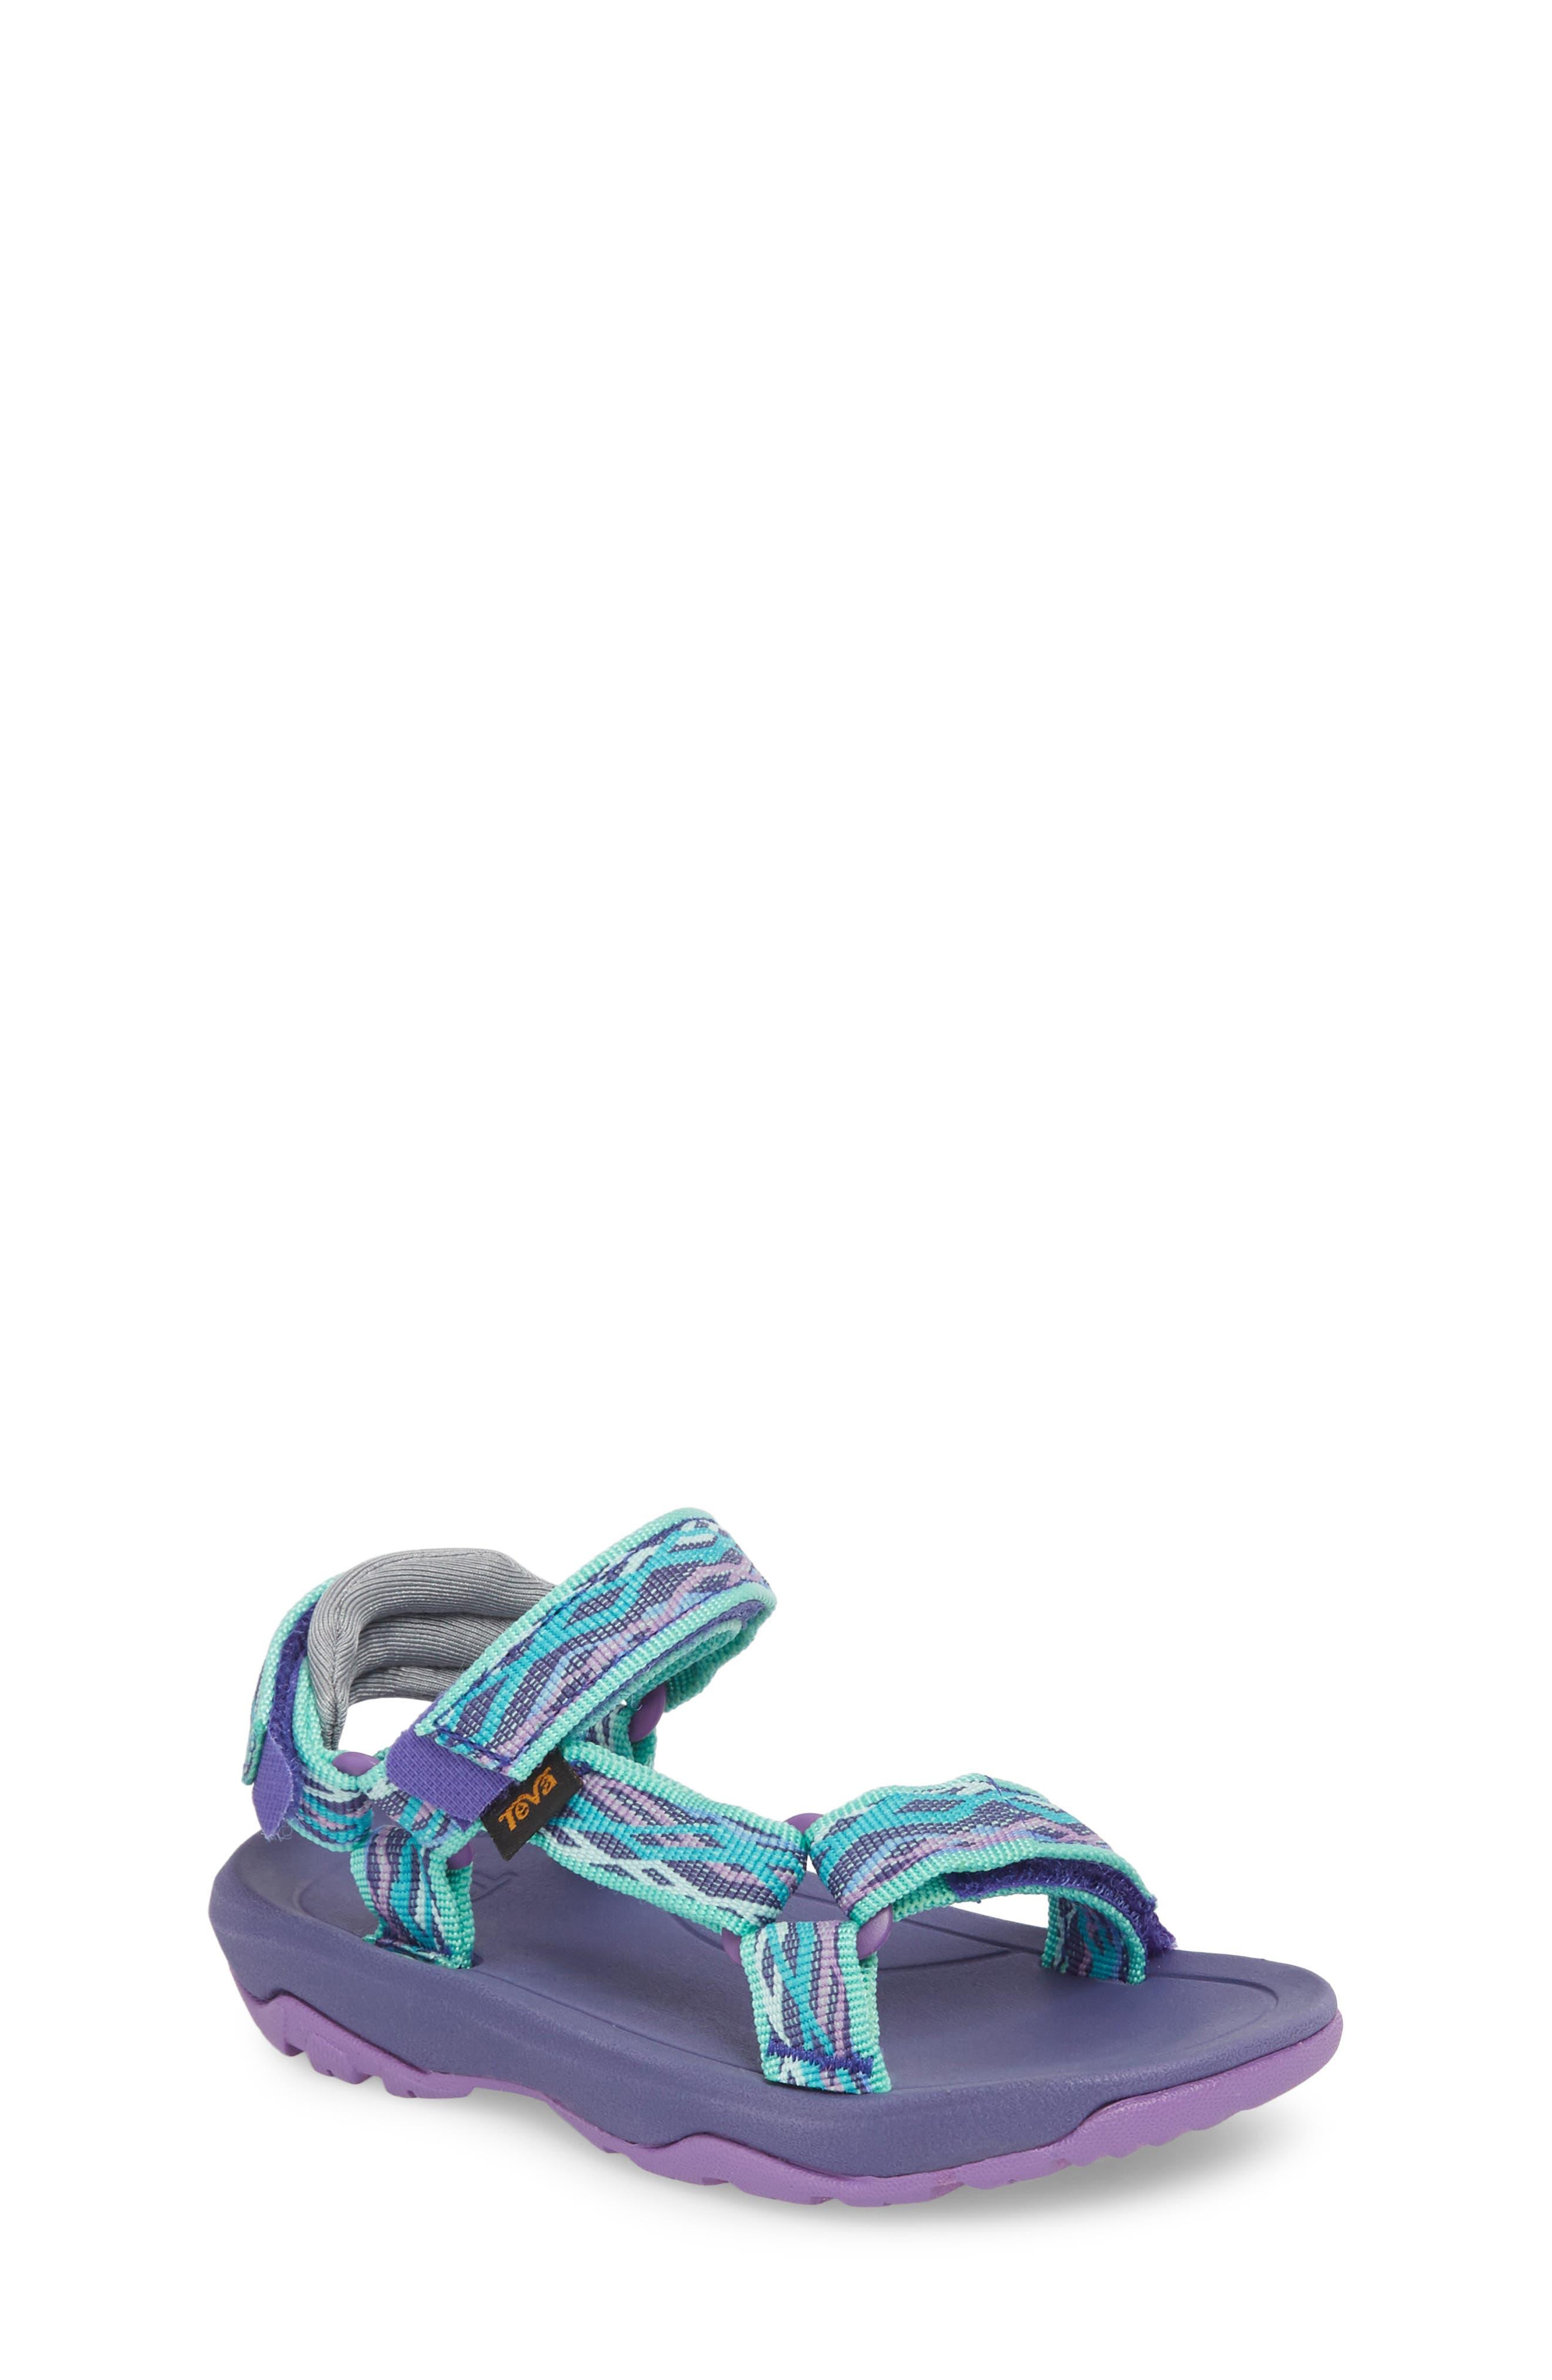 Hurricane XLT 2 Sandal,                         Main,                         color, Delmar Sea Glass / Purple